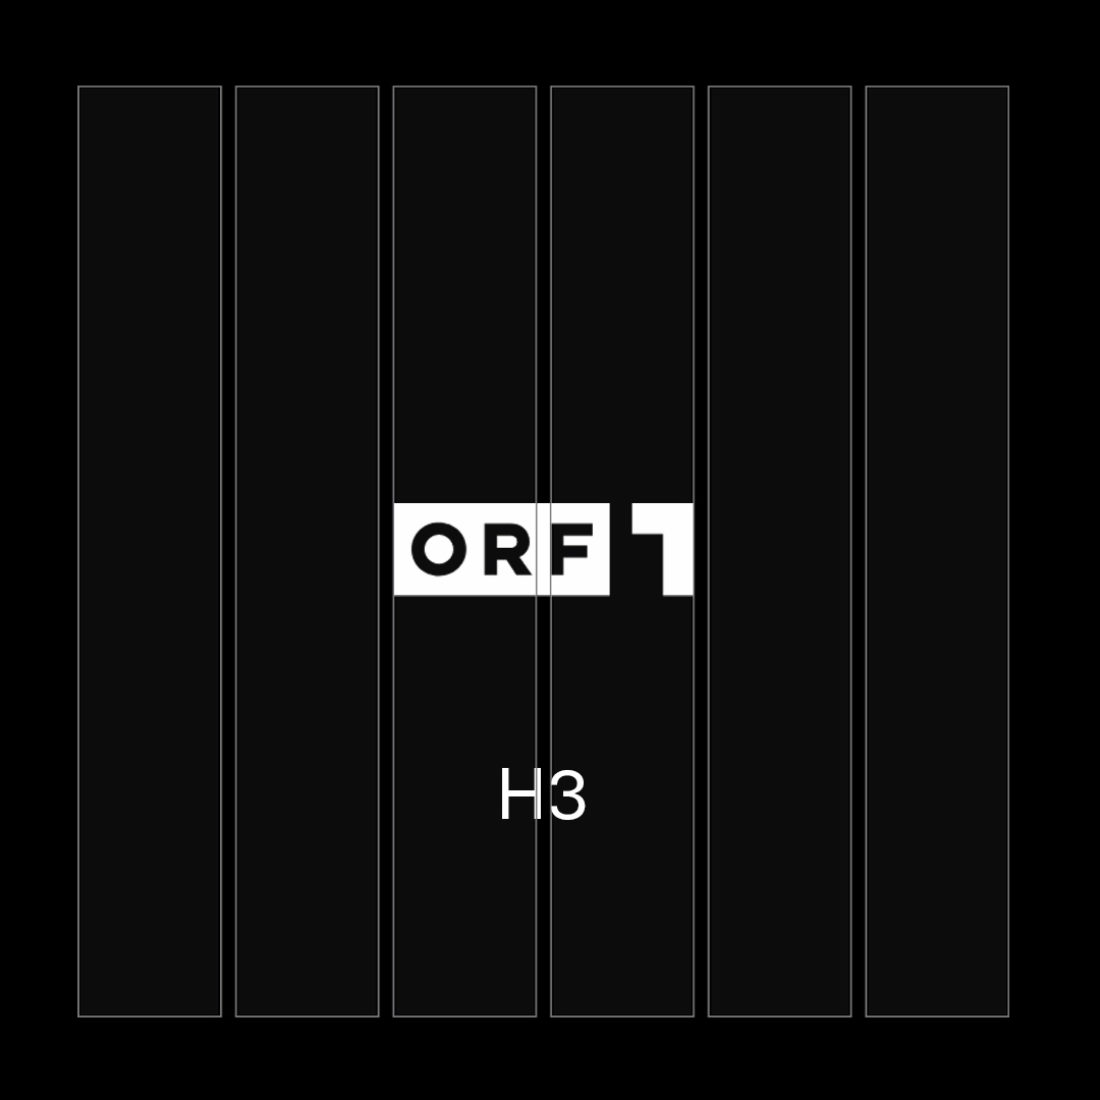 ORFSOMEPOST03